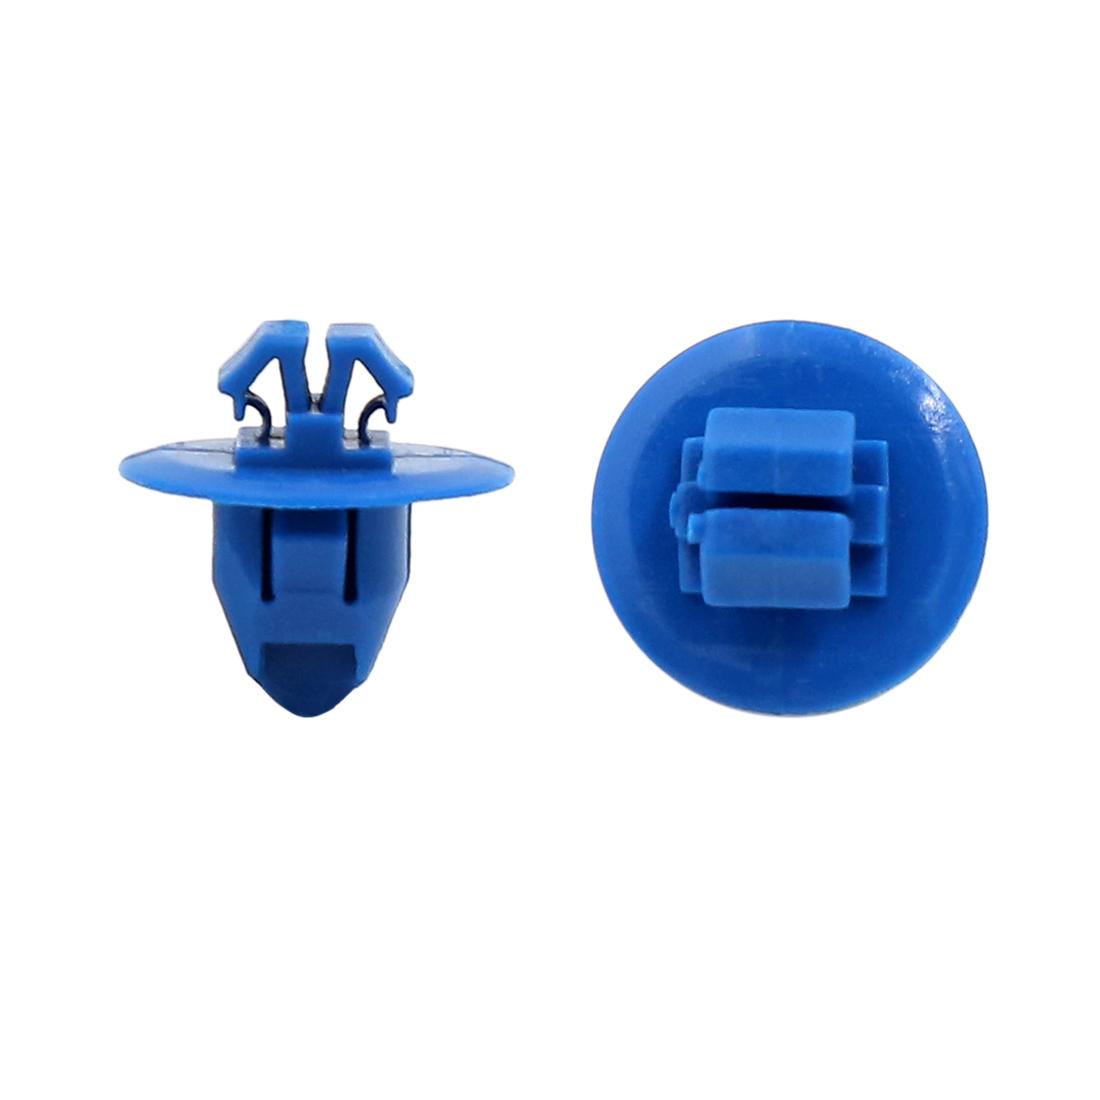 30Pcs Universal Plastic Push Type Rivet Retainer Fastener Bumper Clips Blue 11mm